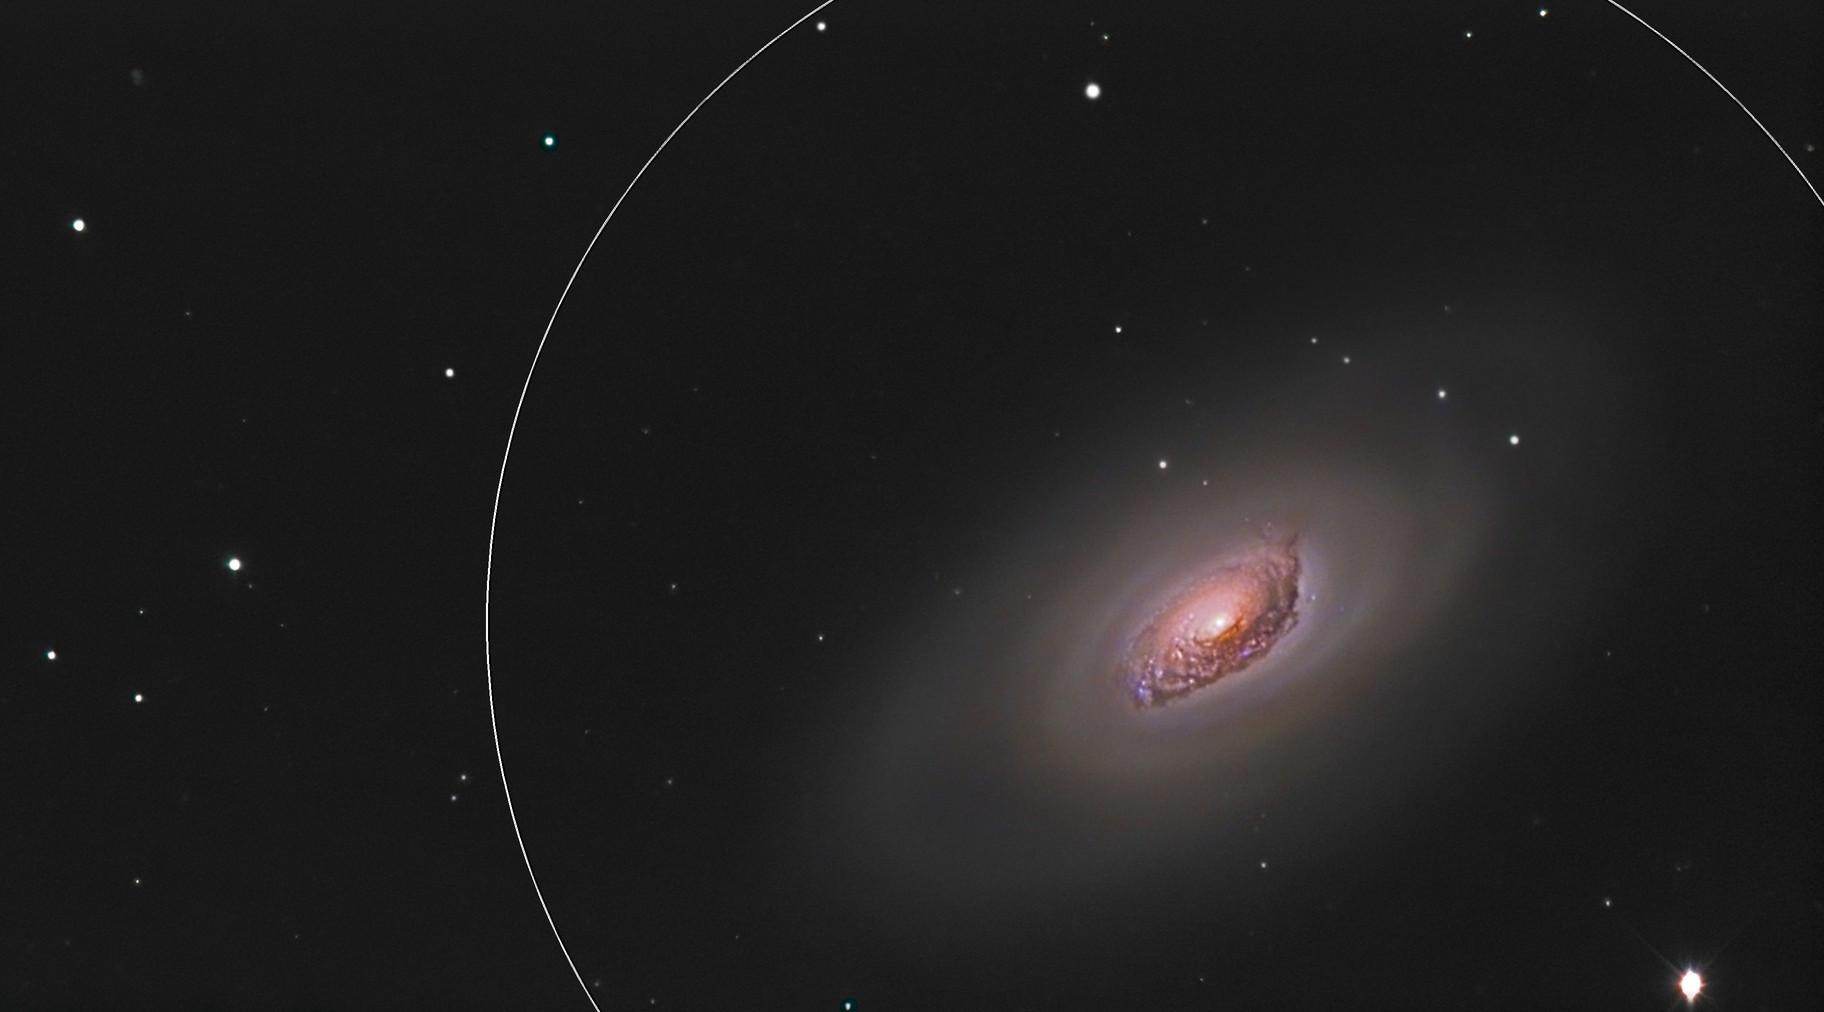 M64: The Sleeping Beauty Galaxy